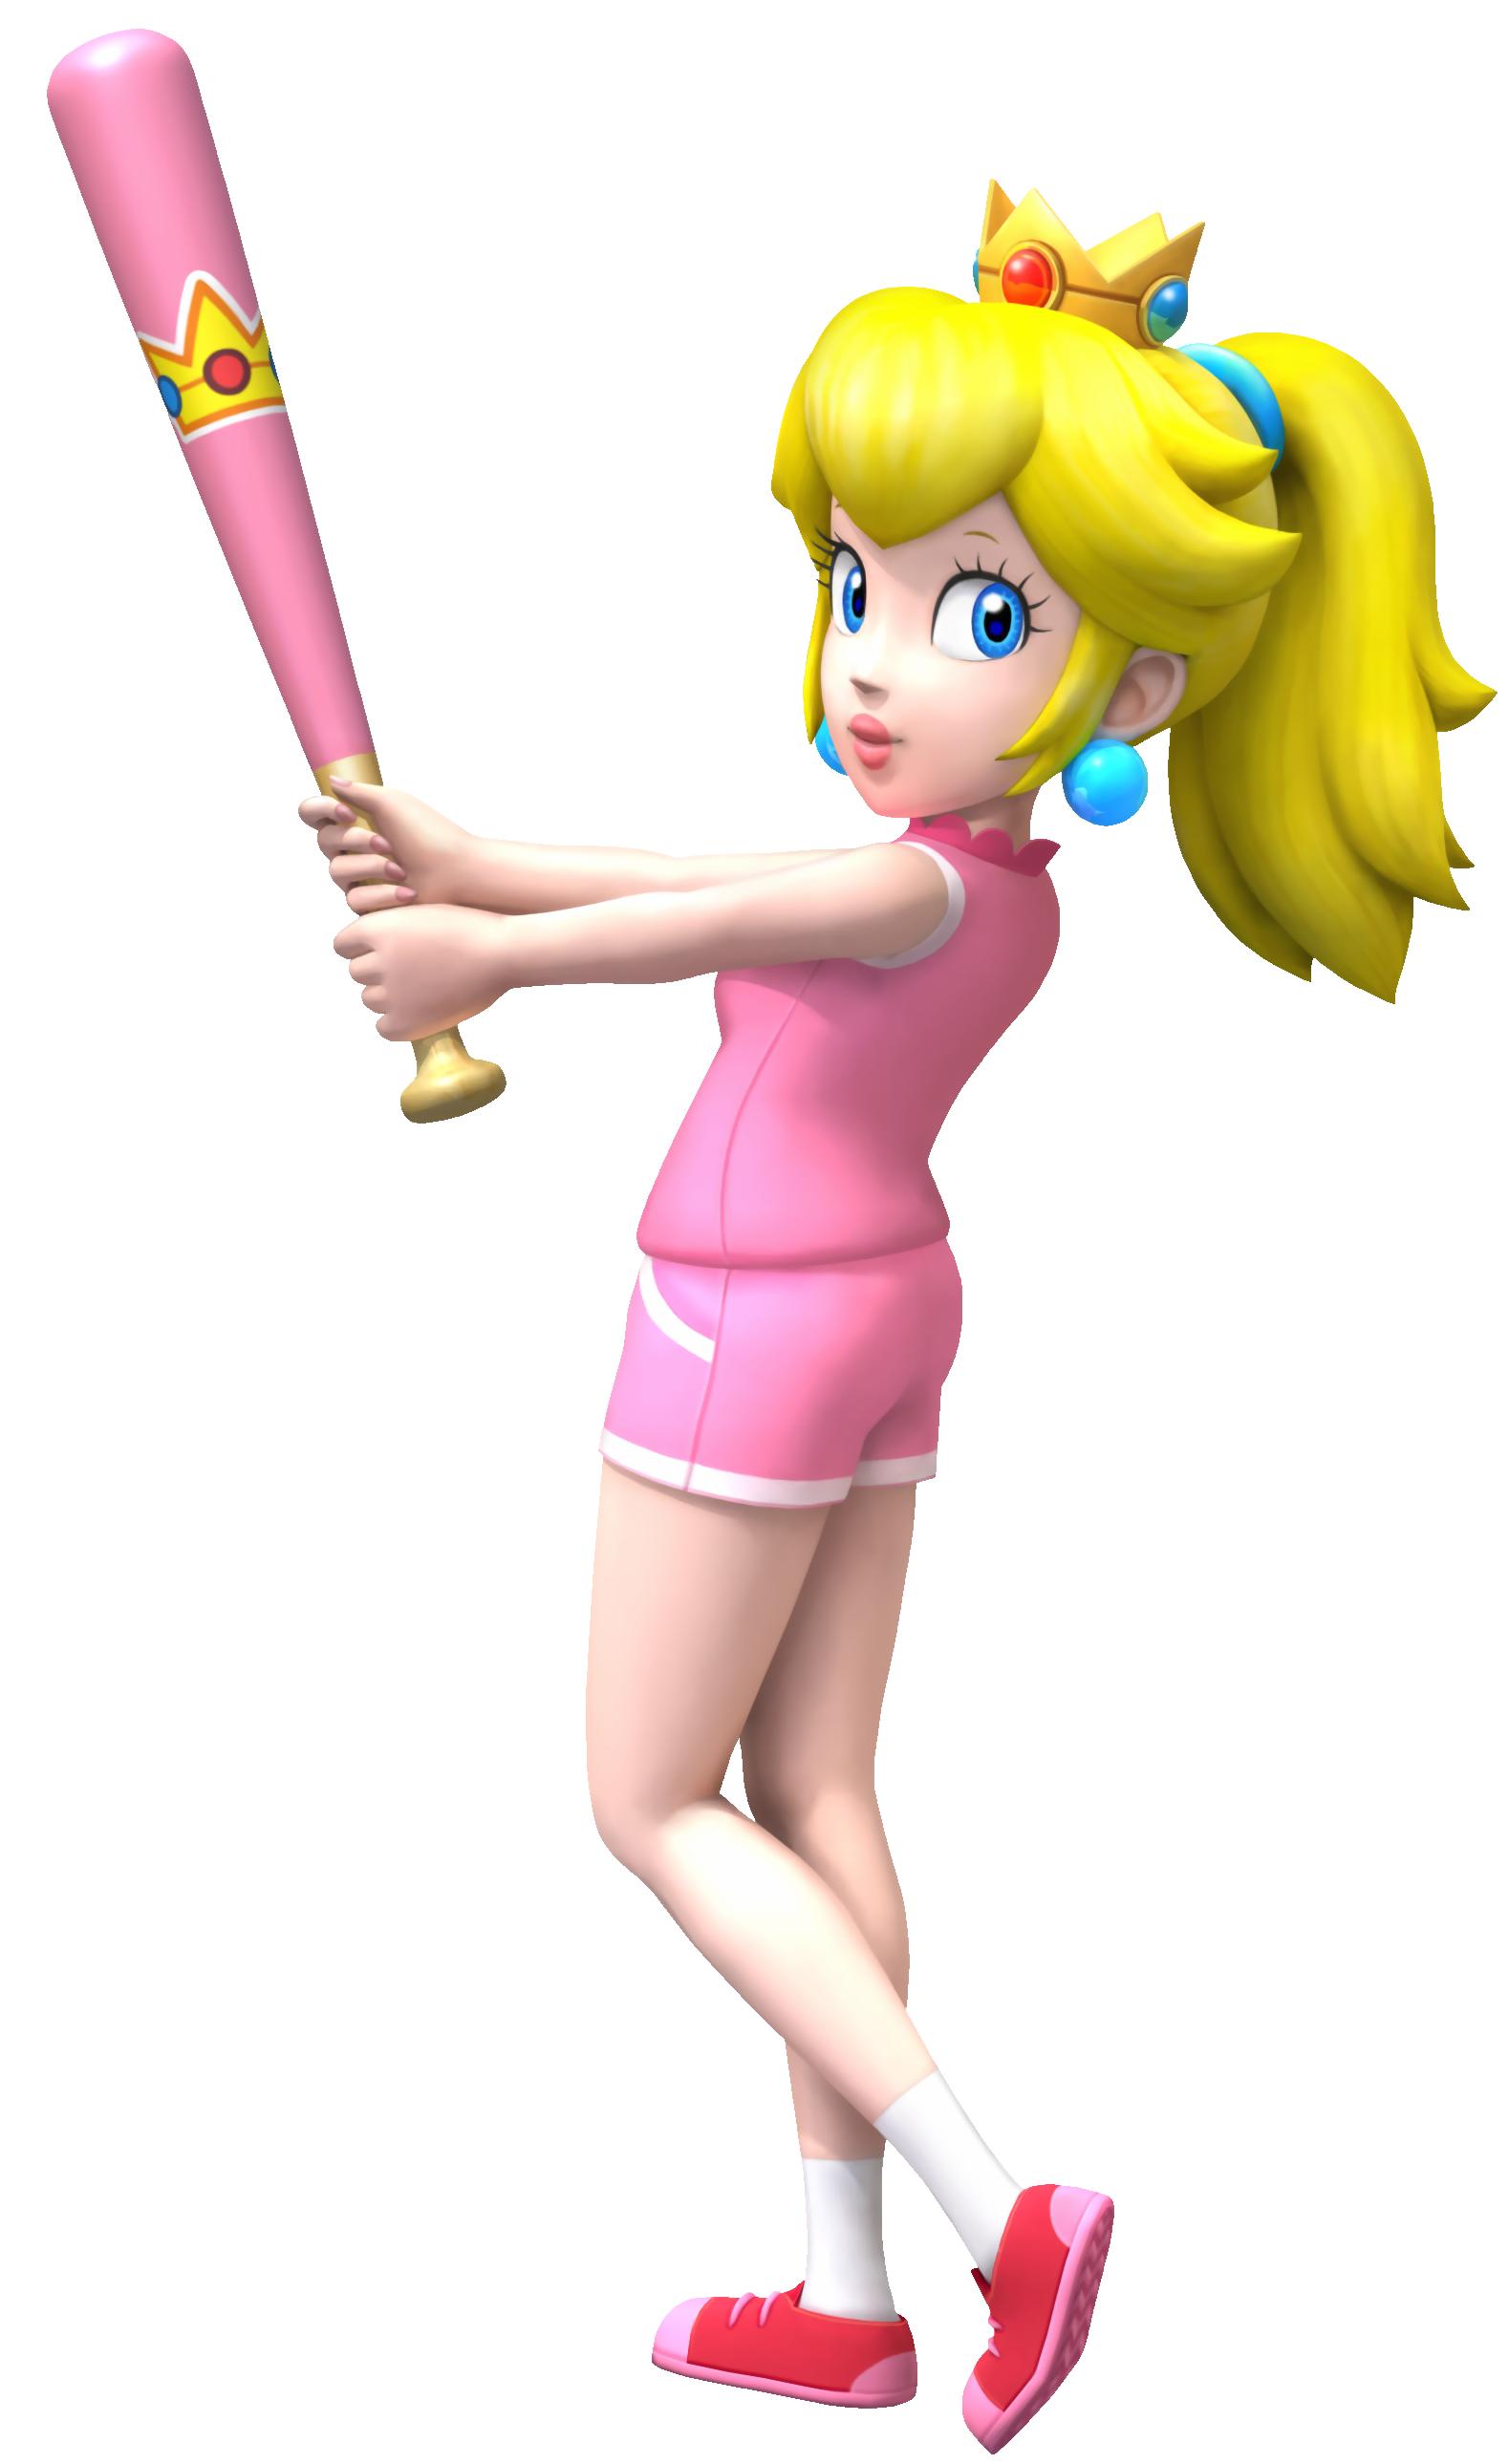 Baseball shredding clipart vector transparent Image - Super Mario Brothers - Princess Peach when playing baseball ... vector transparent